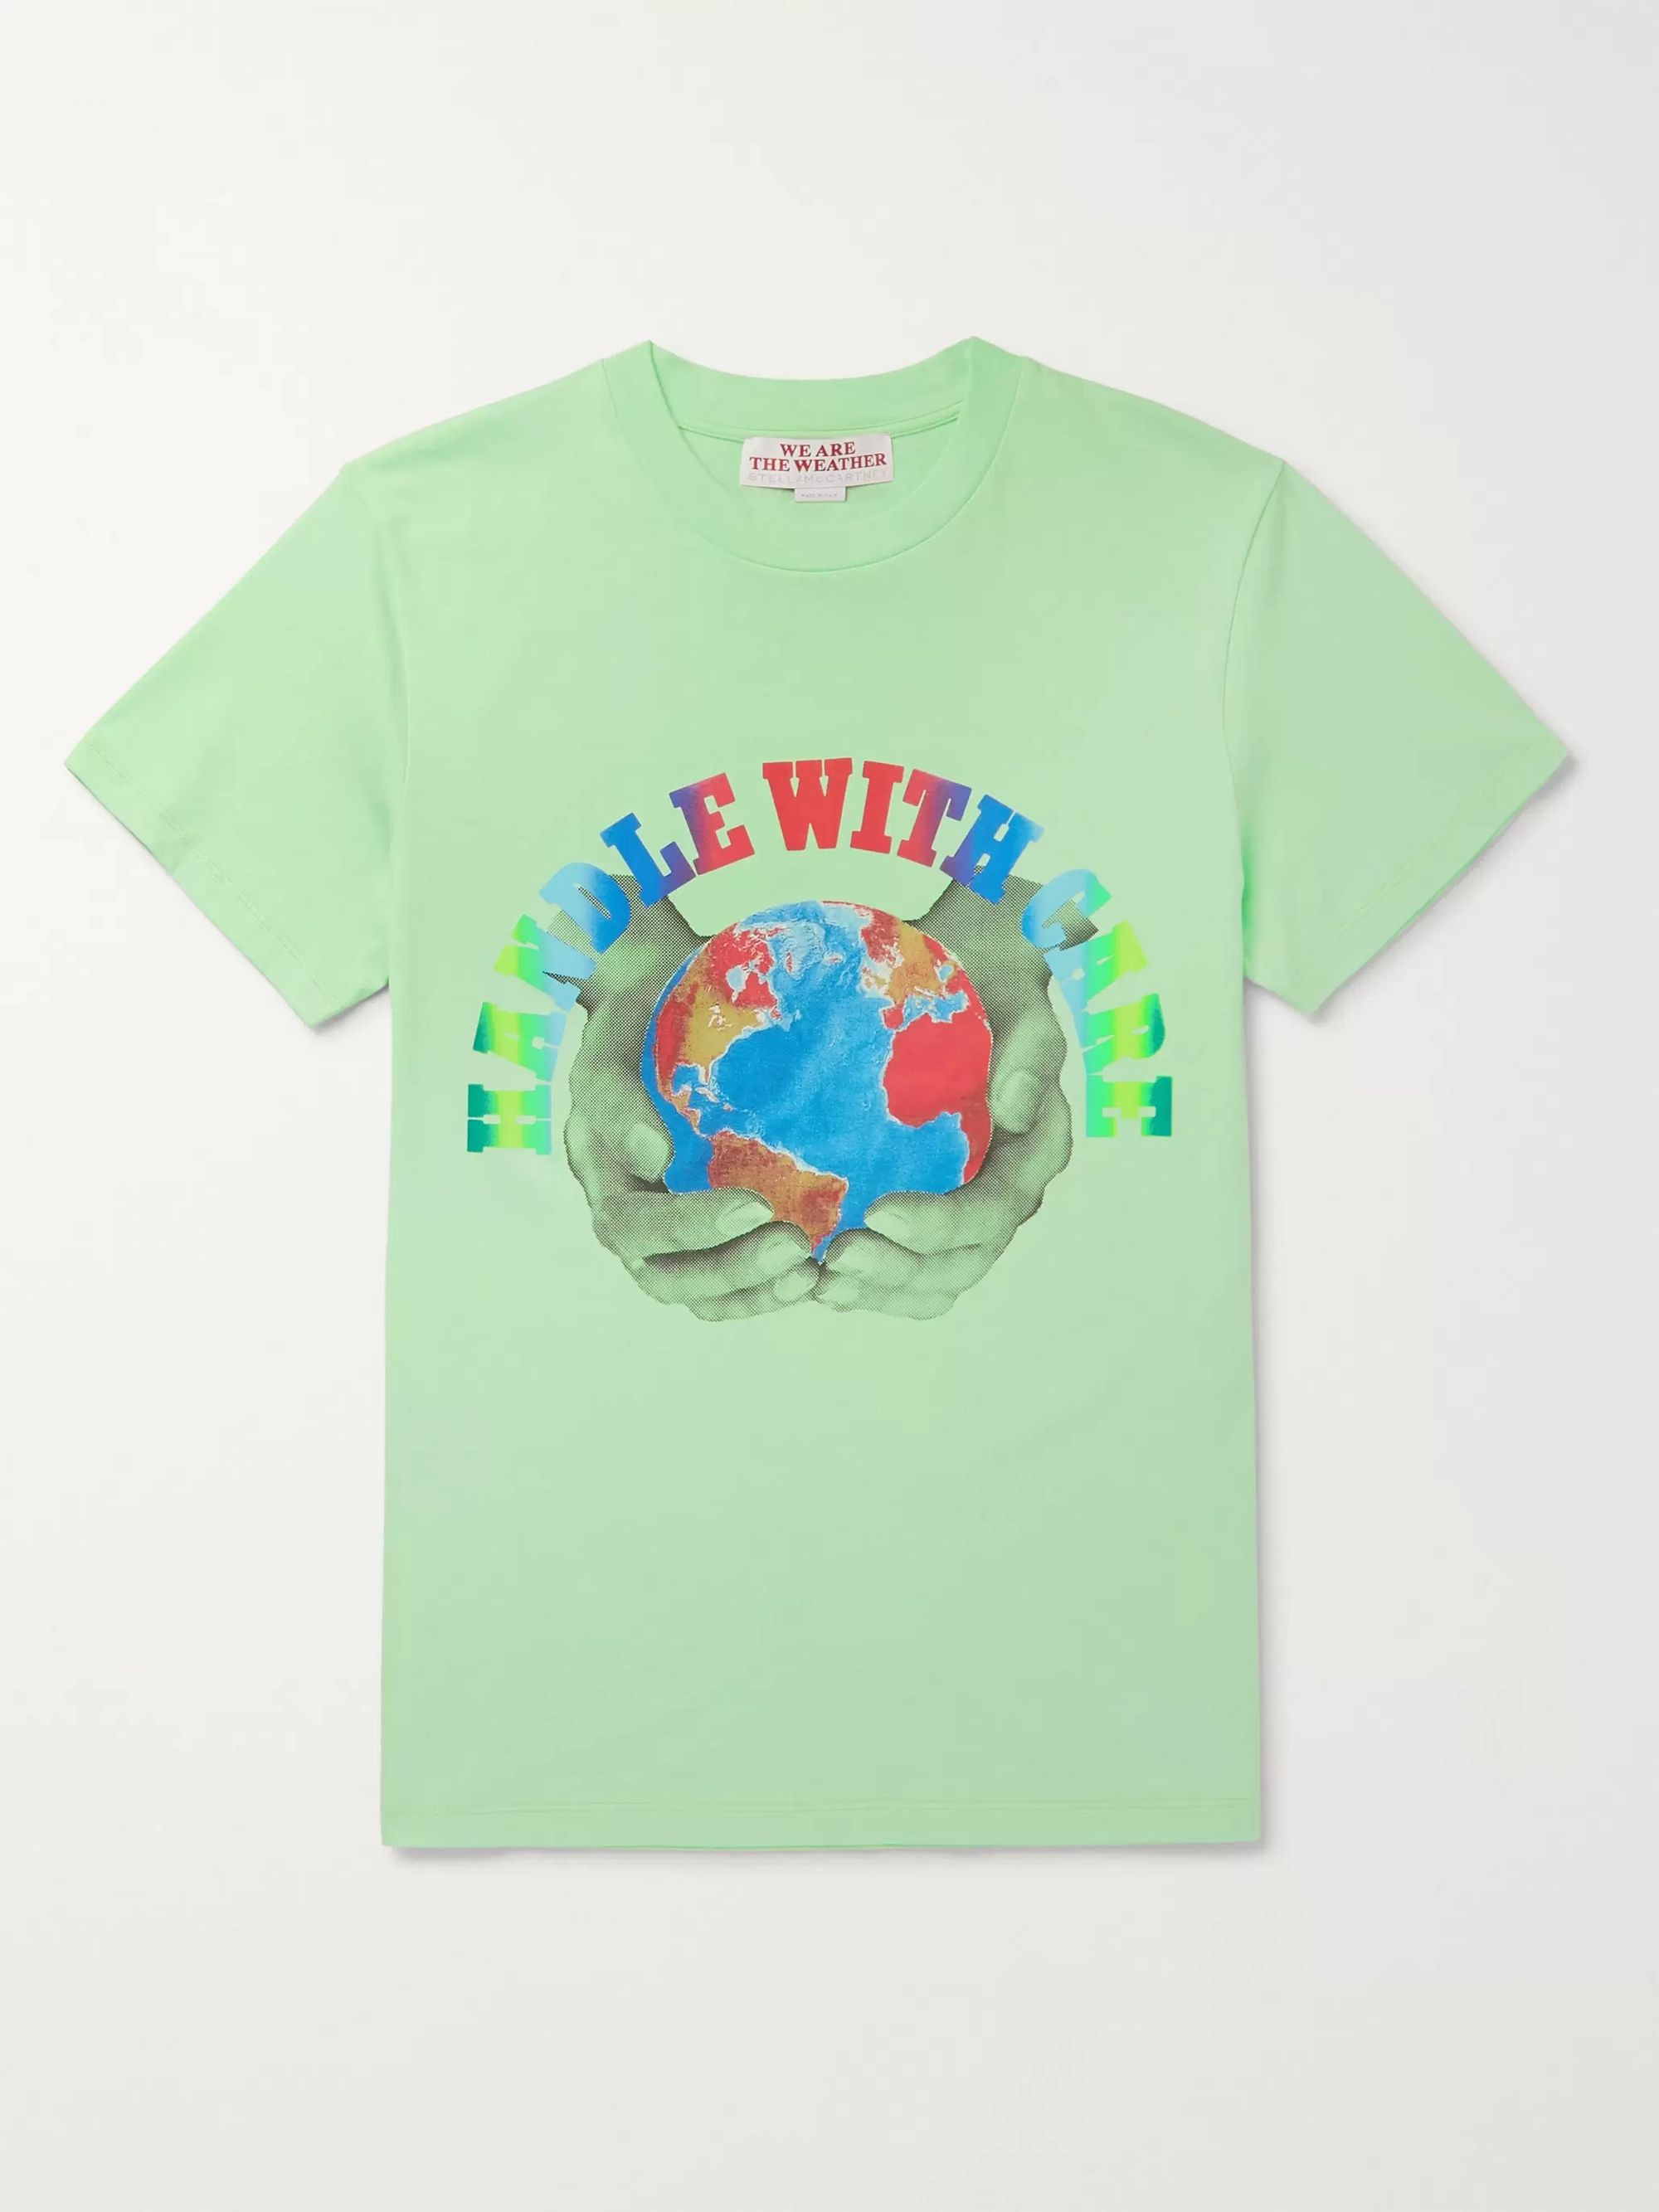 Stella McCartney Slim-Fit Printed Organic Cotton-Jersey T-Shirt